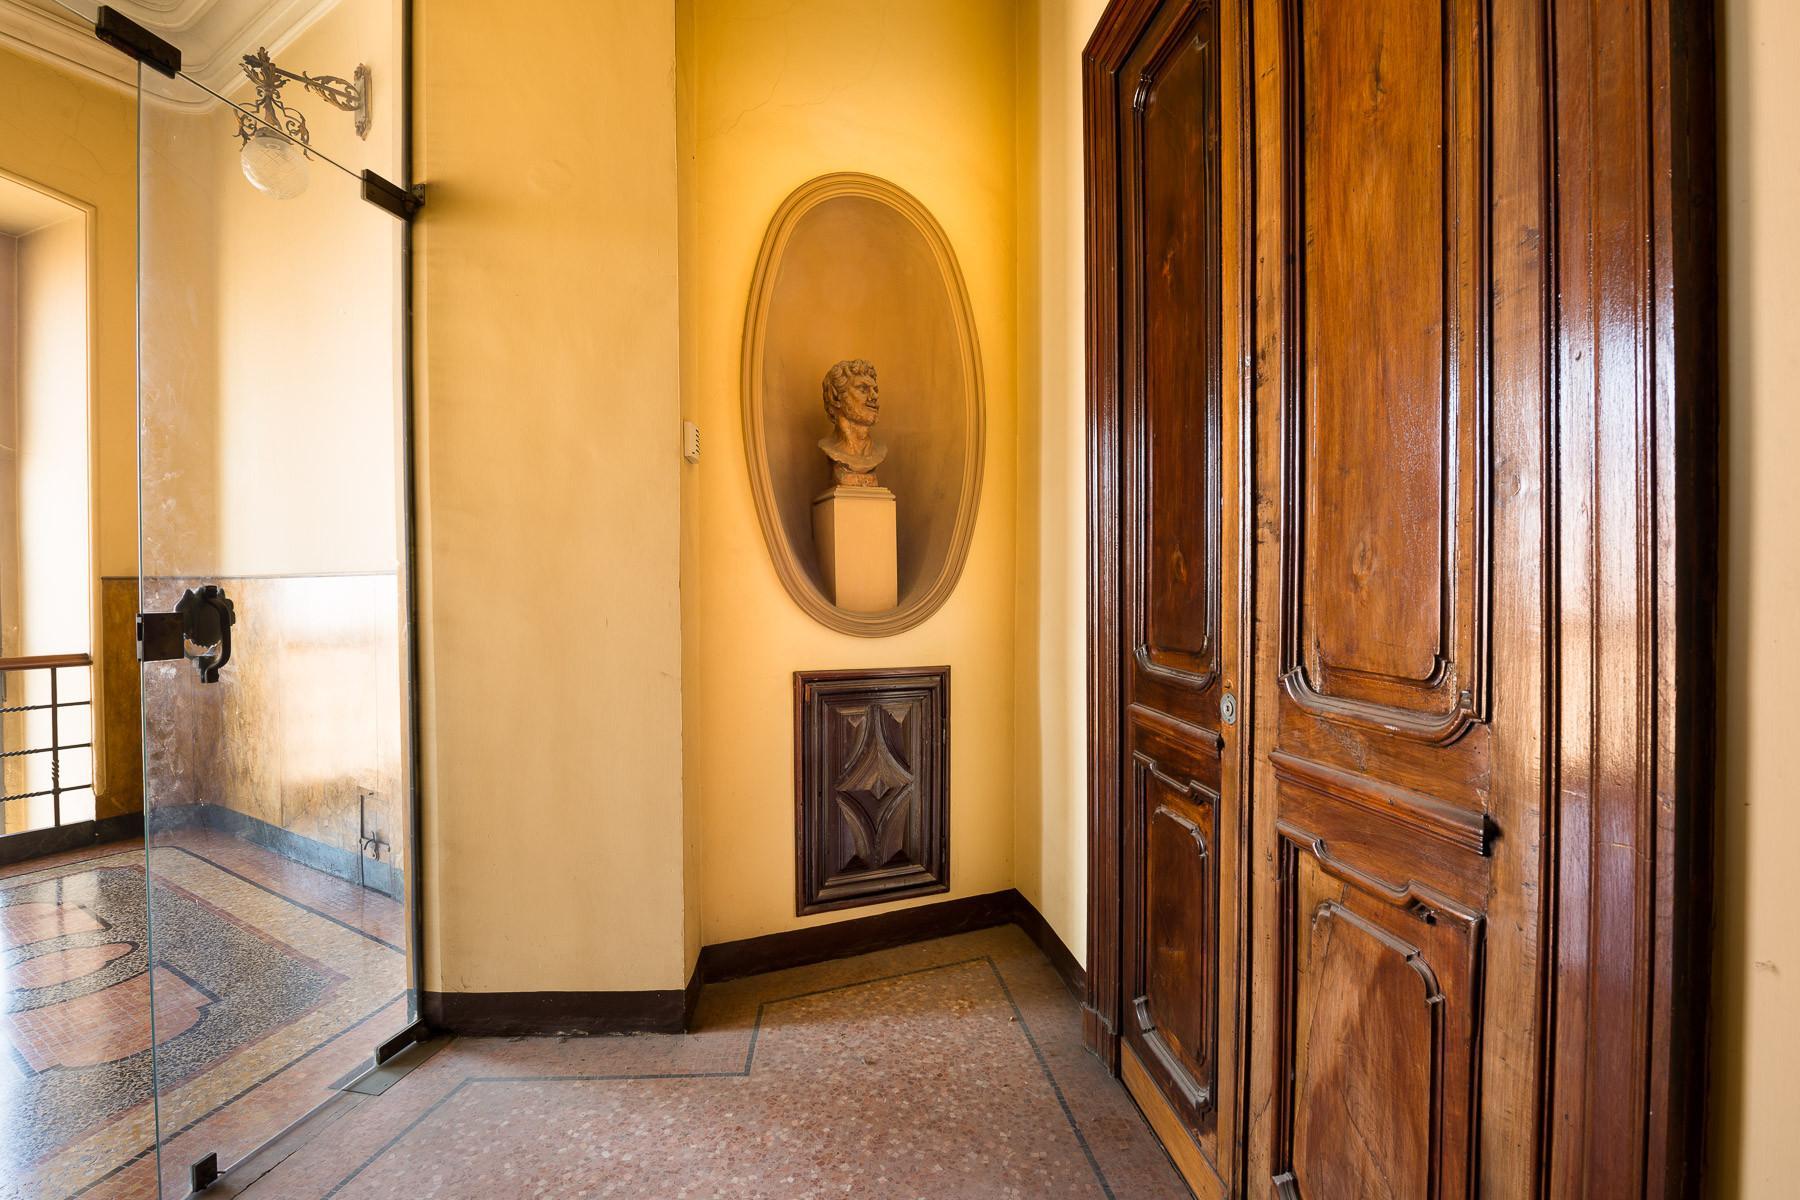 Appartement de prestige dans une villa de style néo baroque - 8